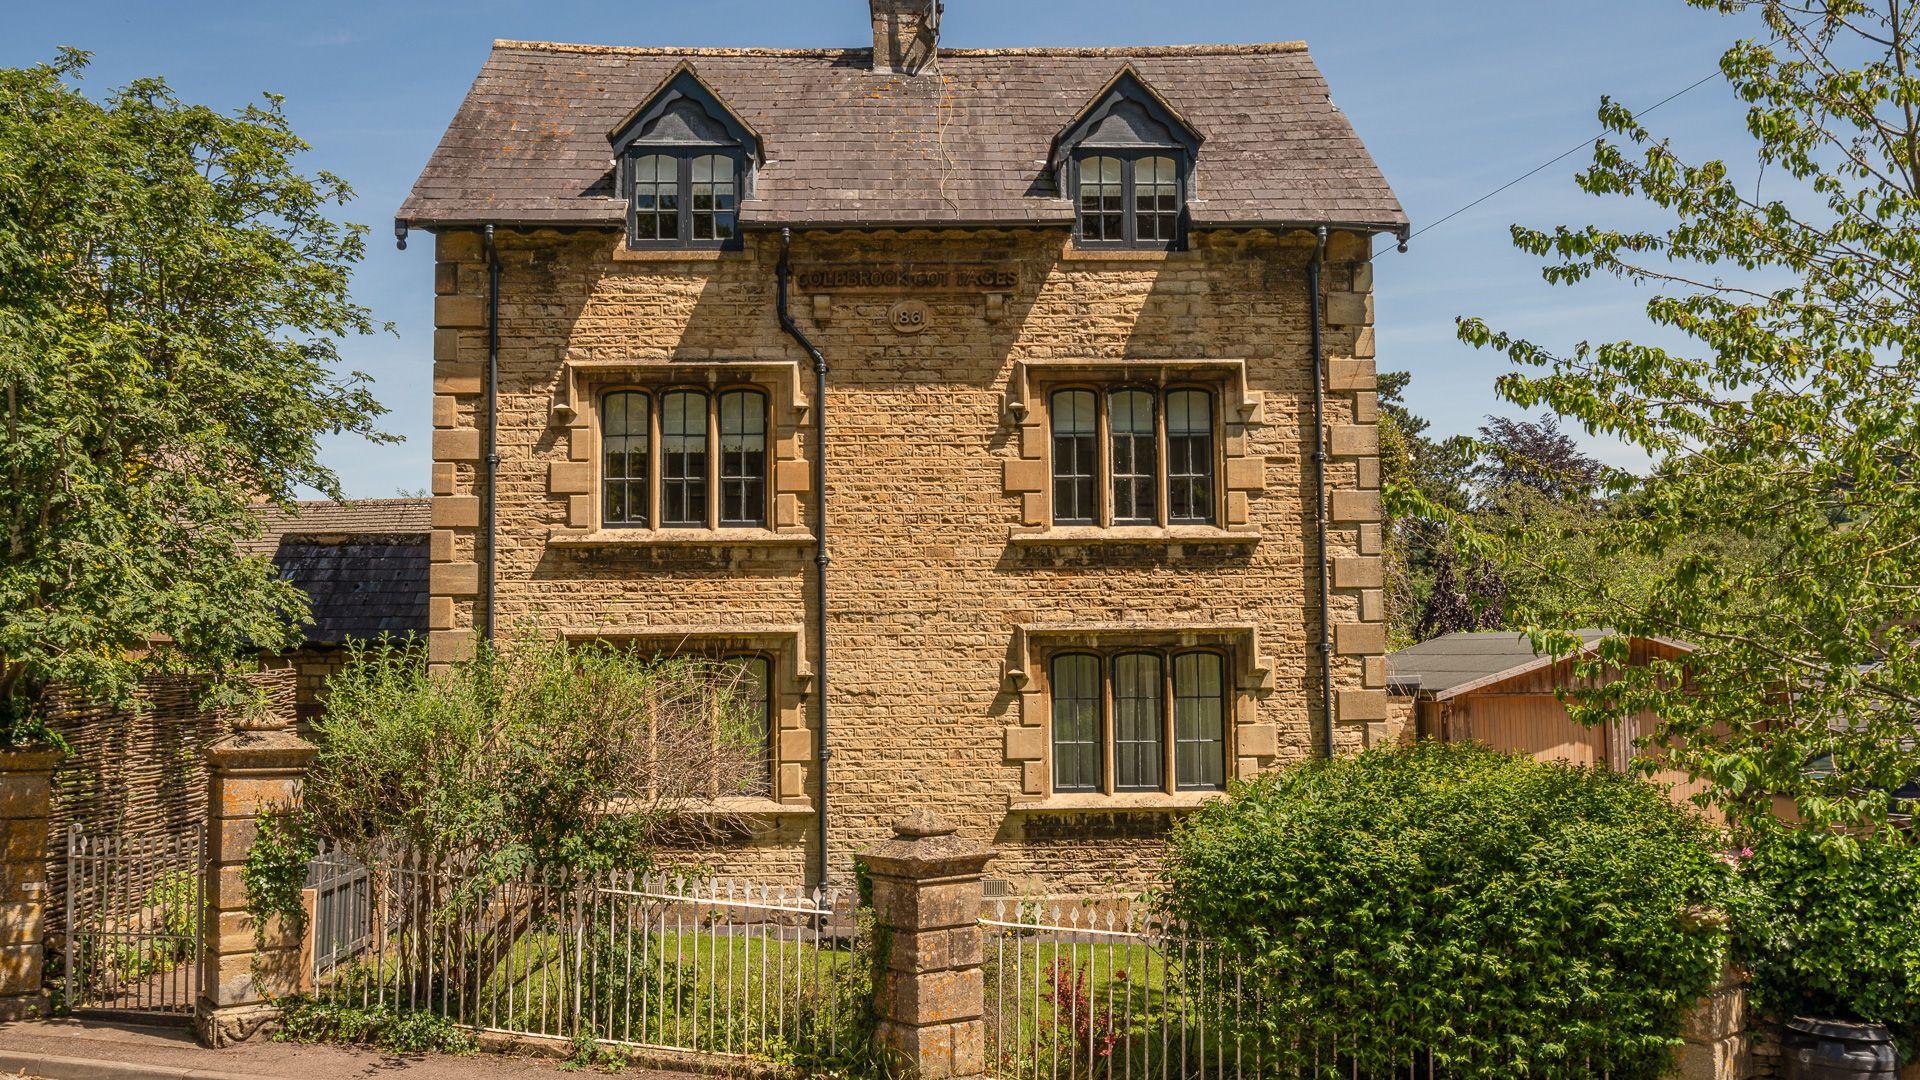 Front View, Colebrook Cottage, Bolthole Retreats